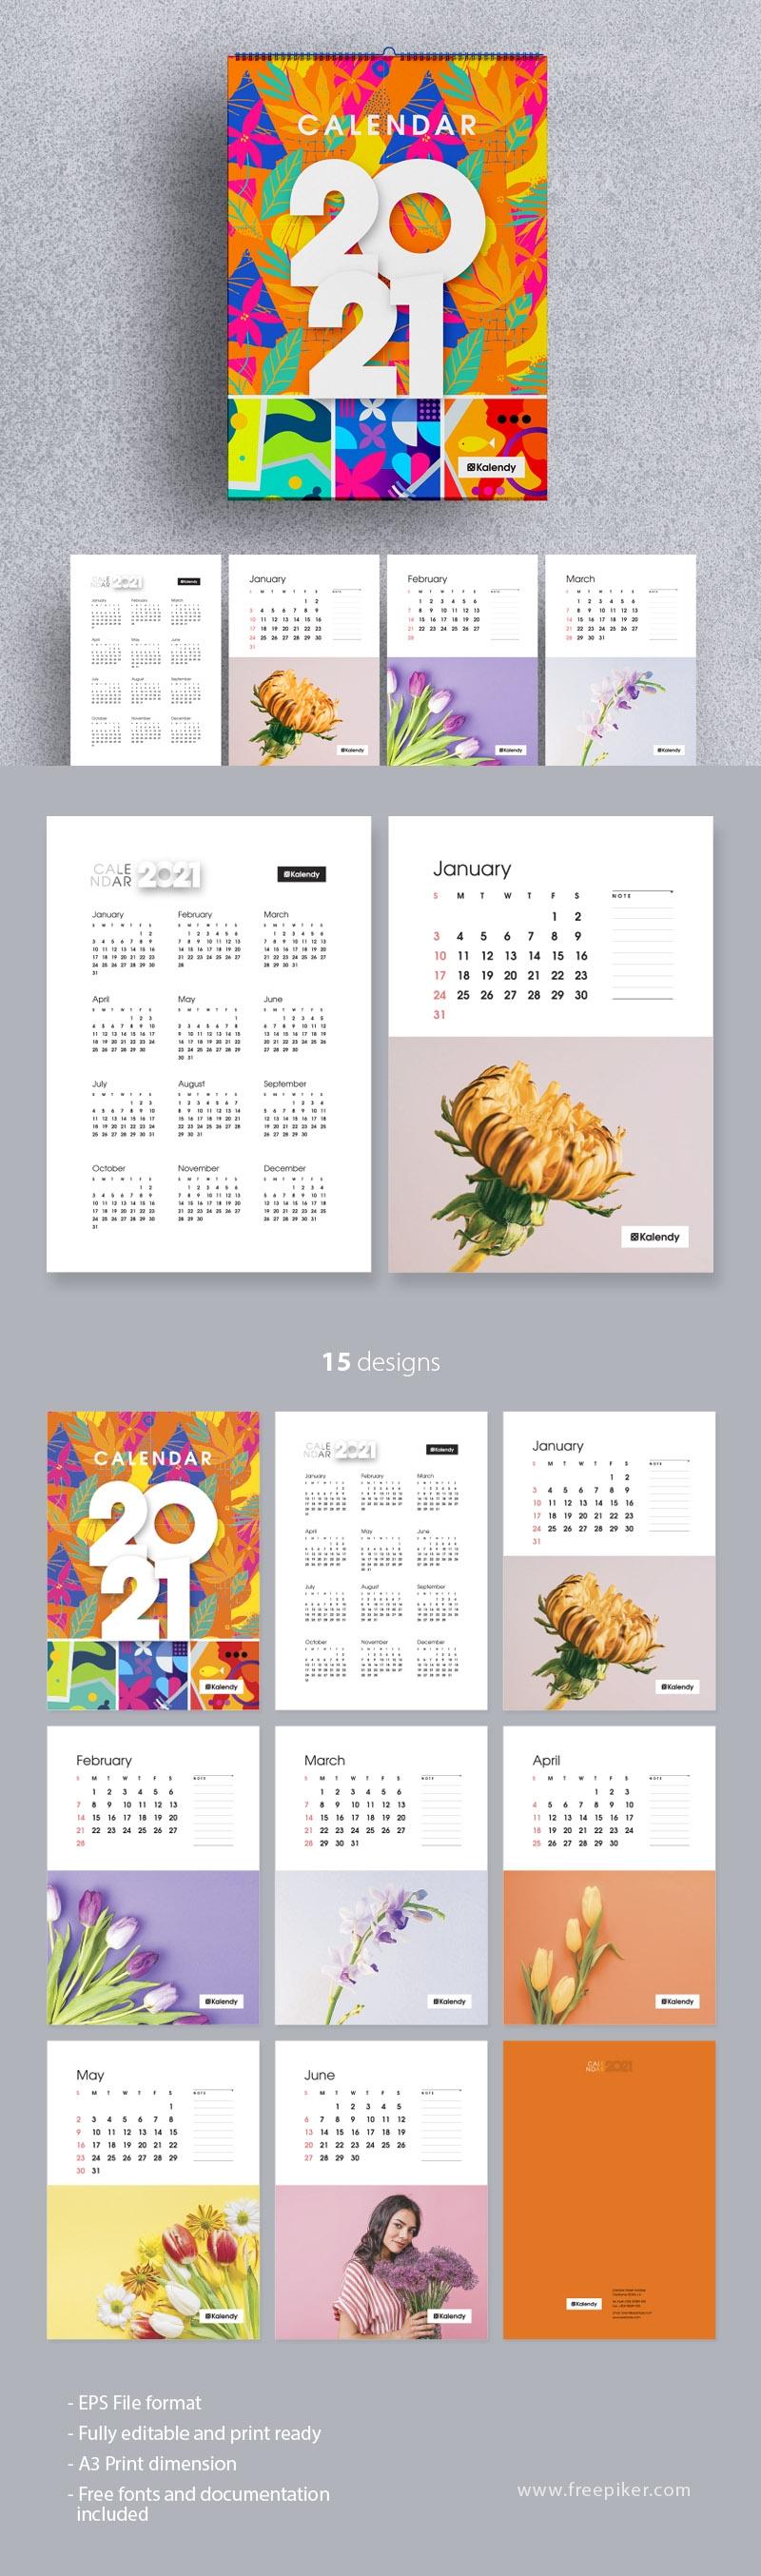 Wall Calendar 2021 - New Year Planner